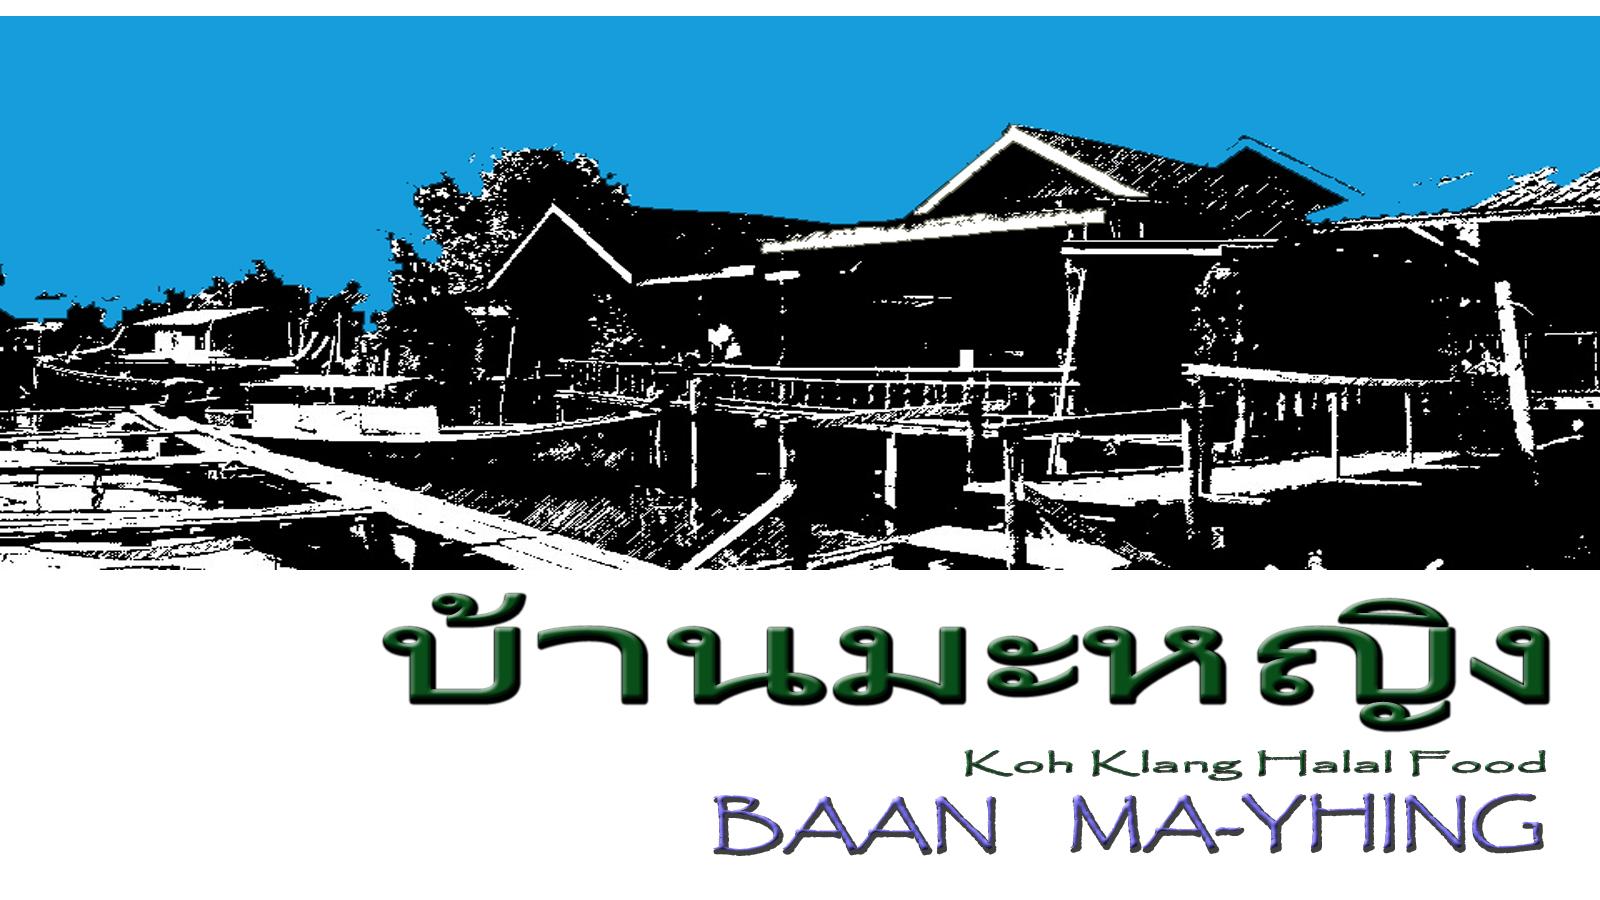 Baan Ma-Yhing